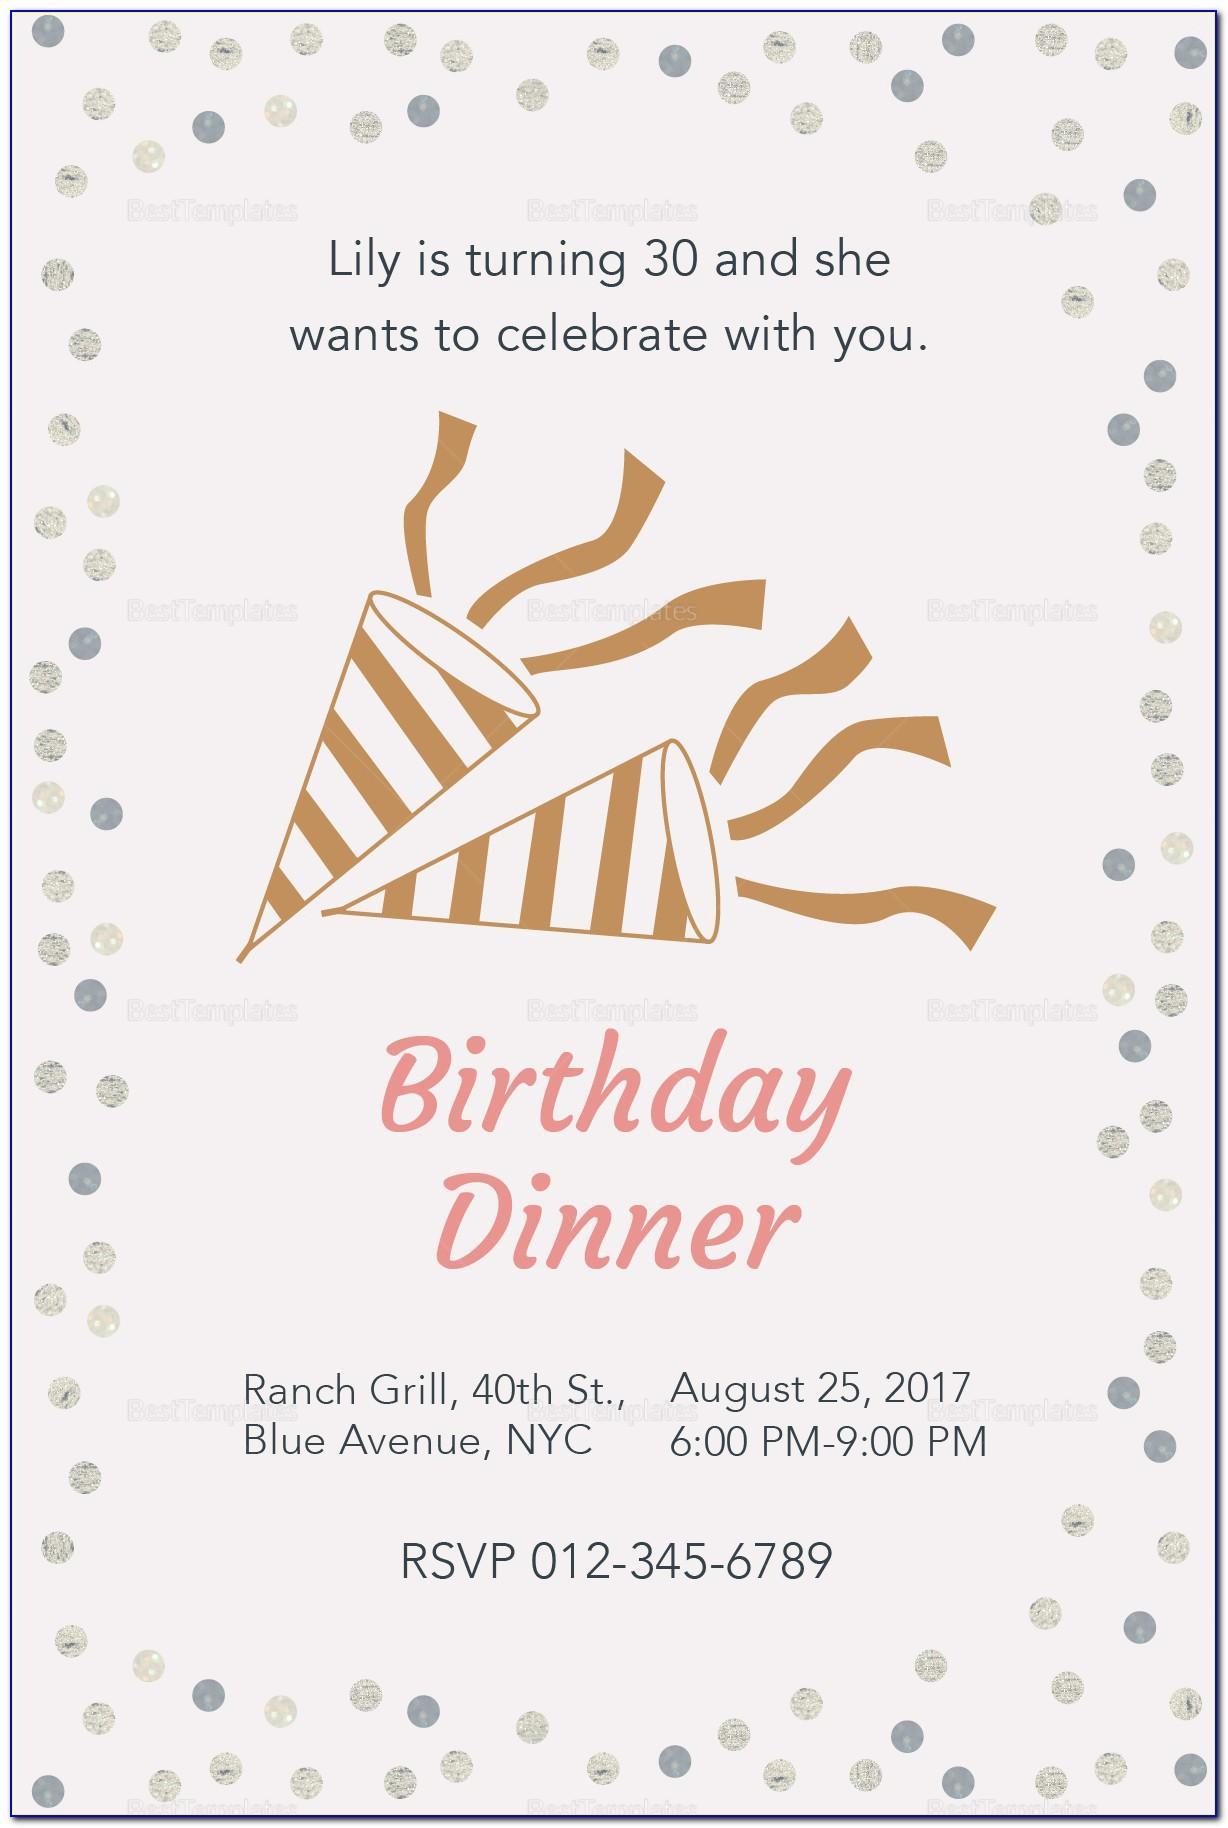 Dinner Invitation Template Free